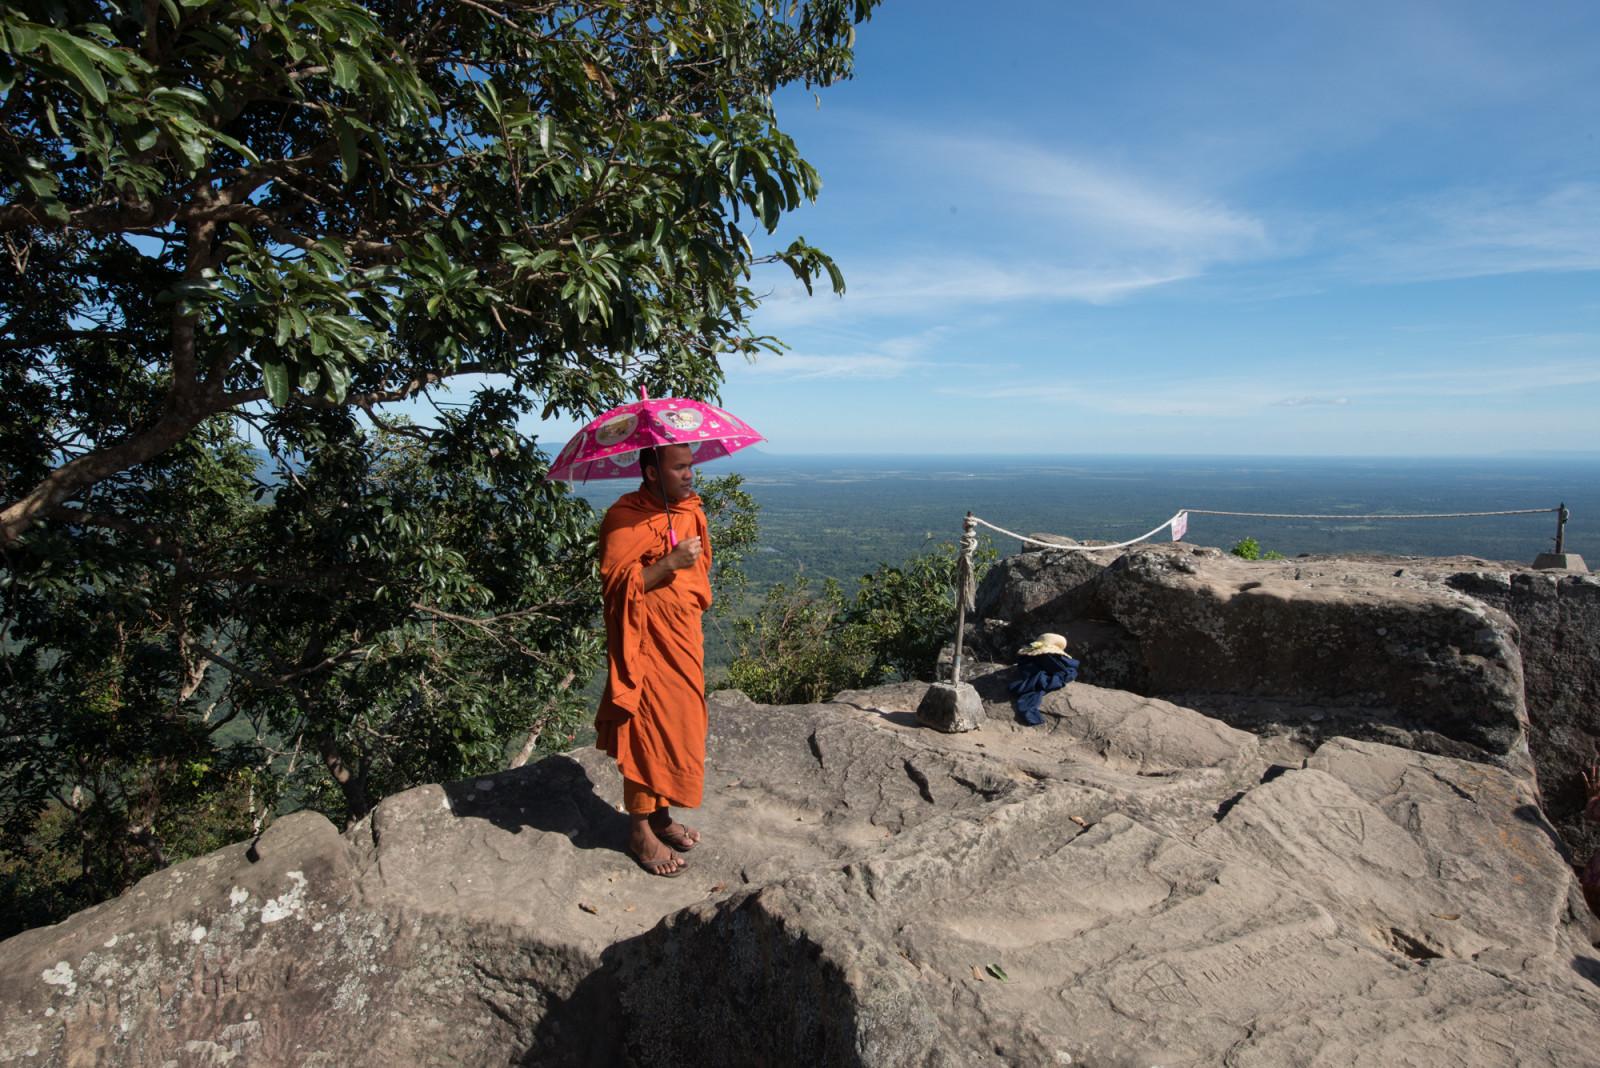 cambodia-photo-tours-preah-vihear-temple-monk